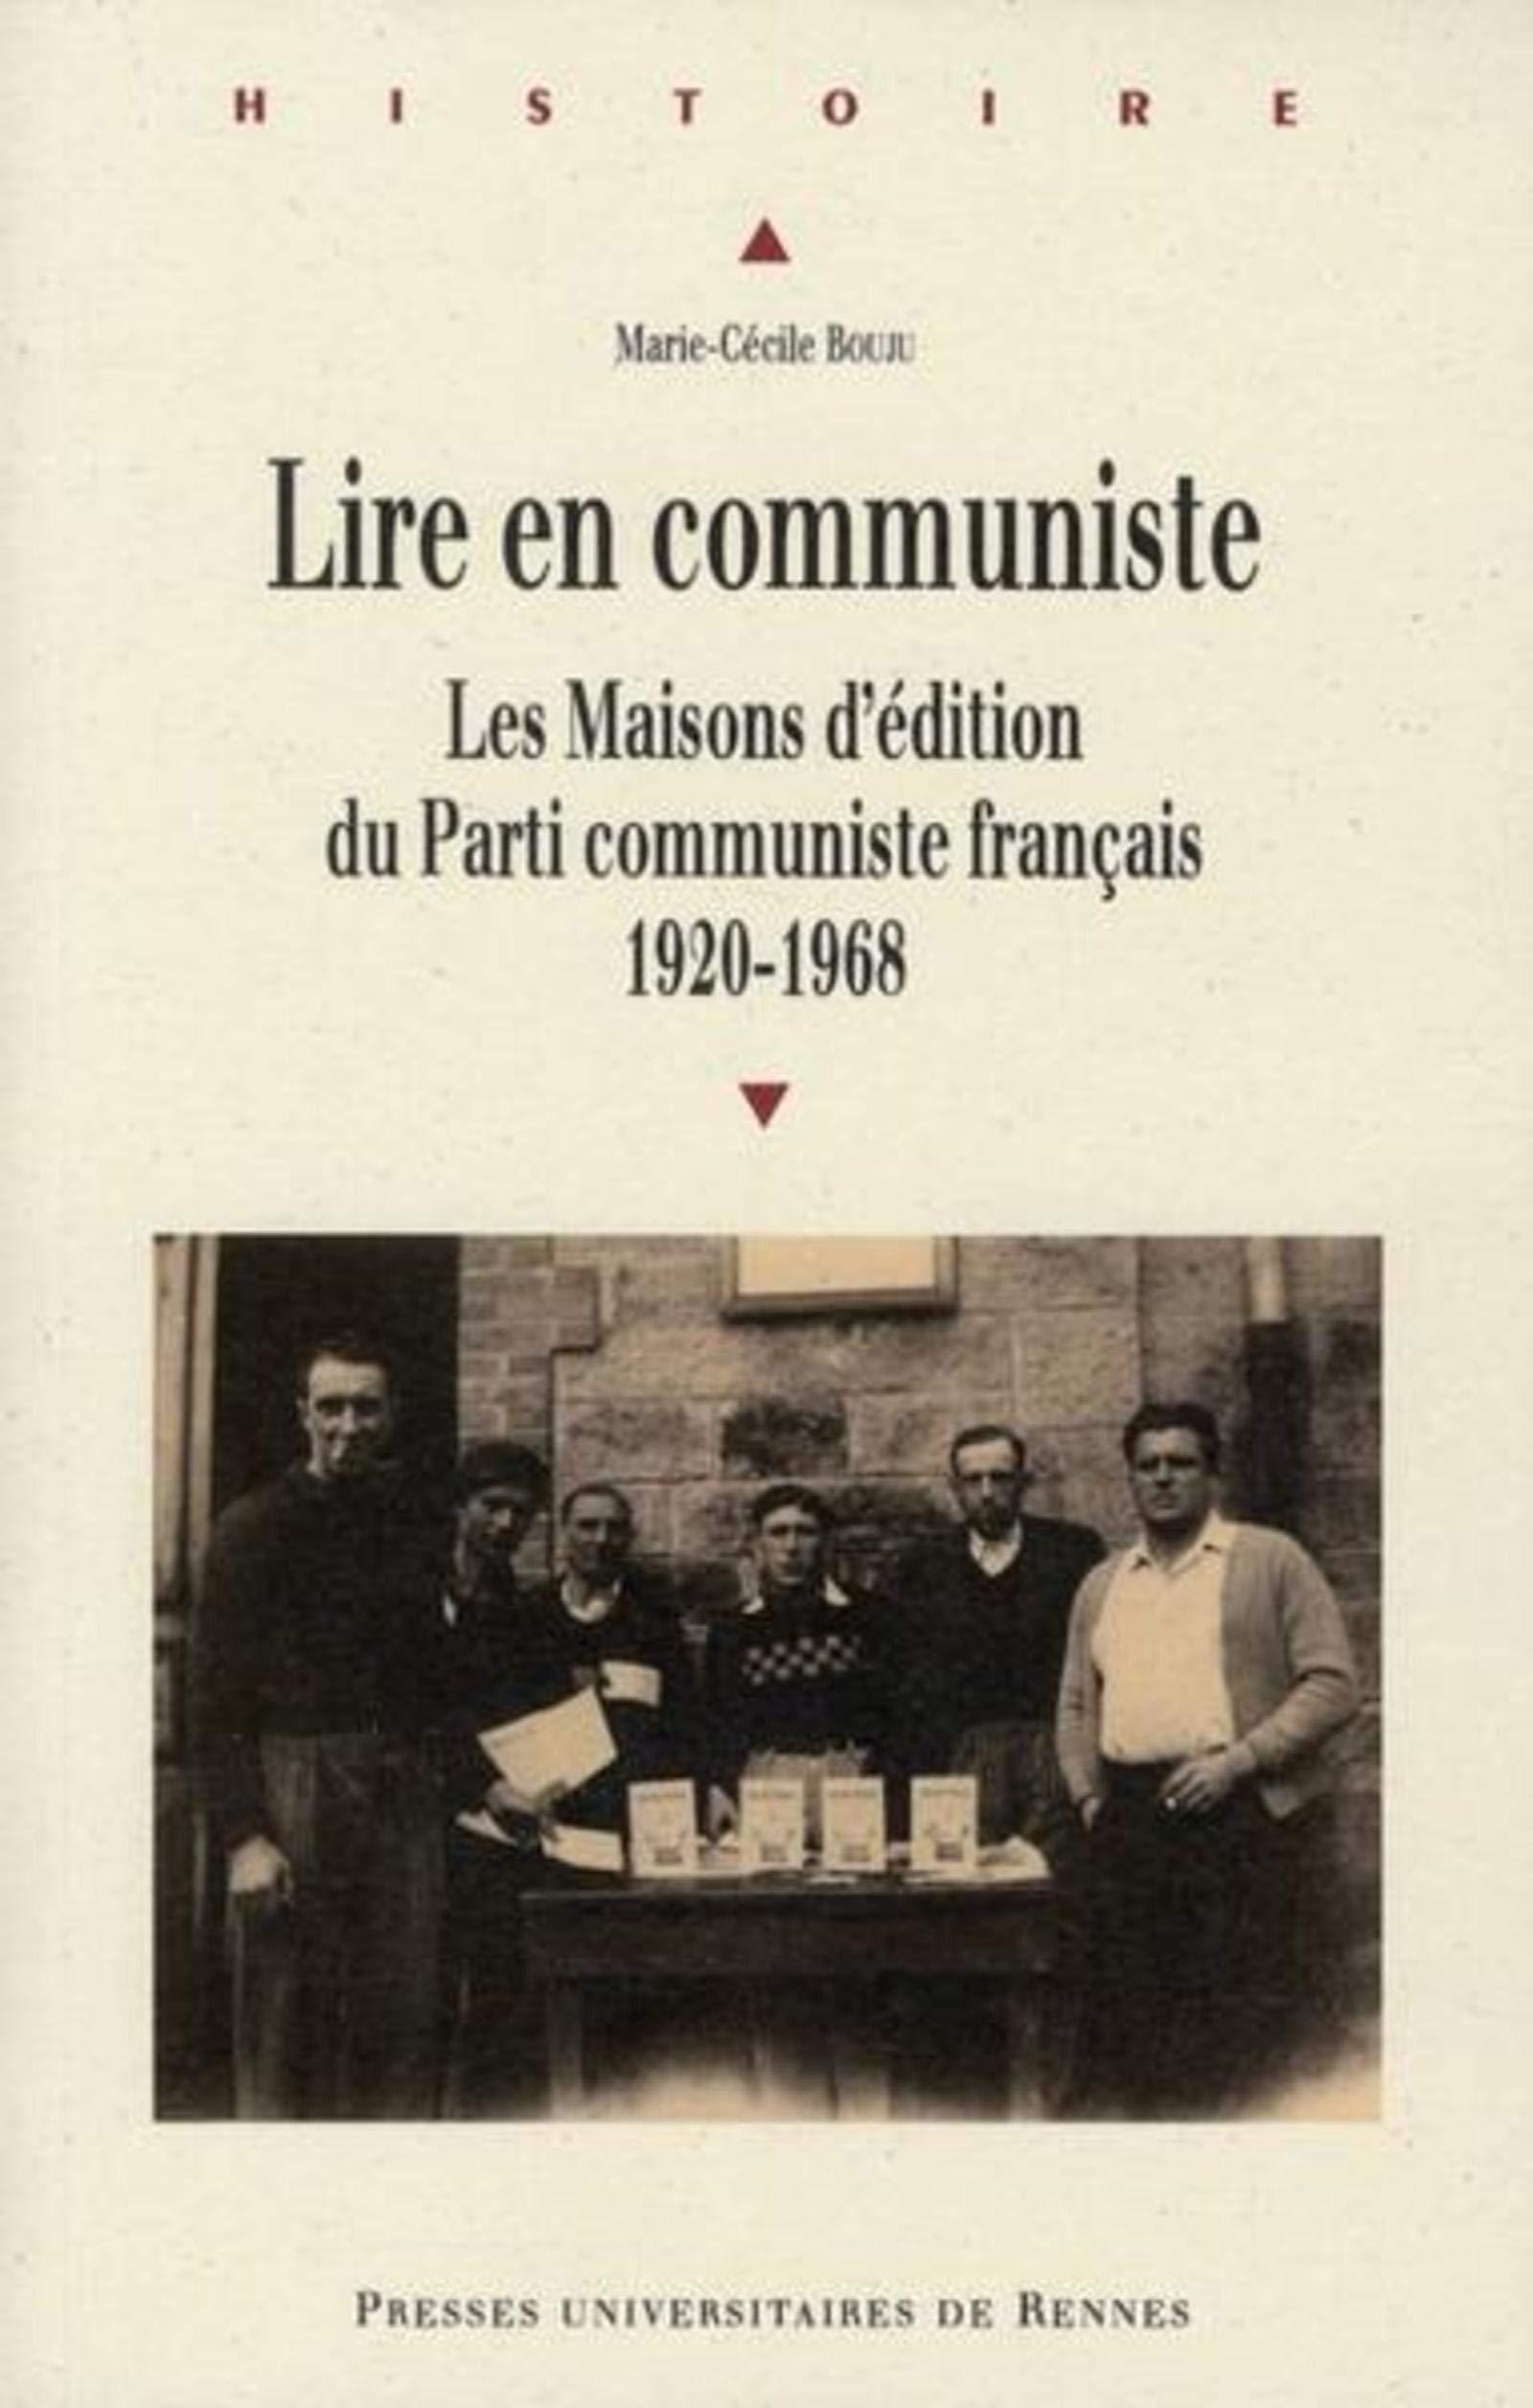 Lire En Communiste Histoire Bouju Marie Cecile 9782753512306 Amazon Com Books